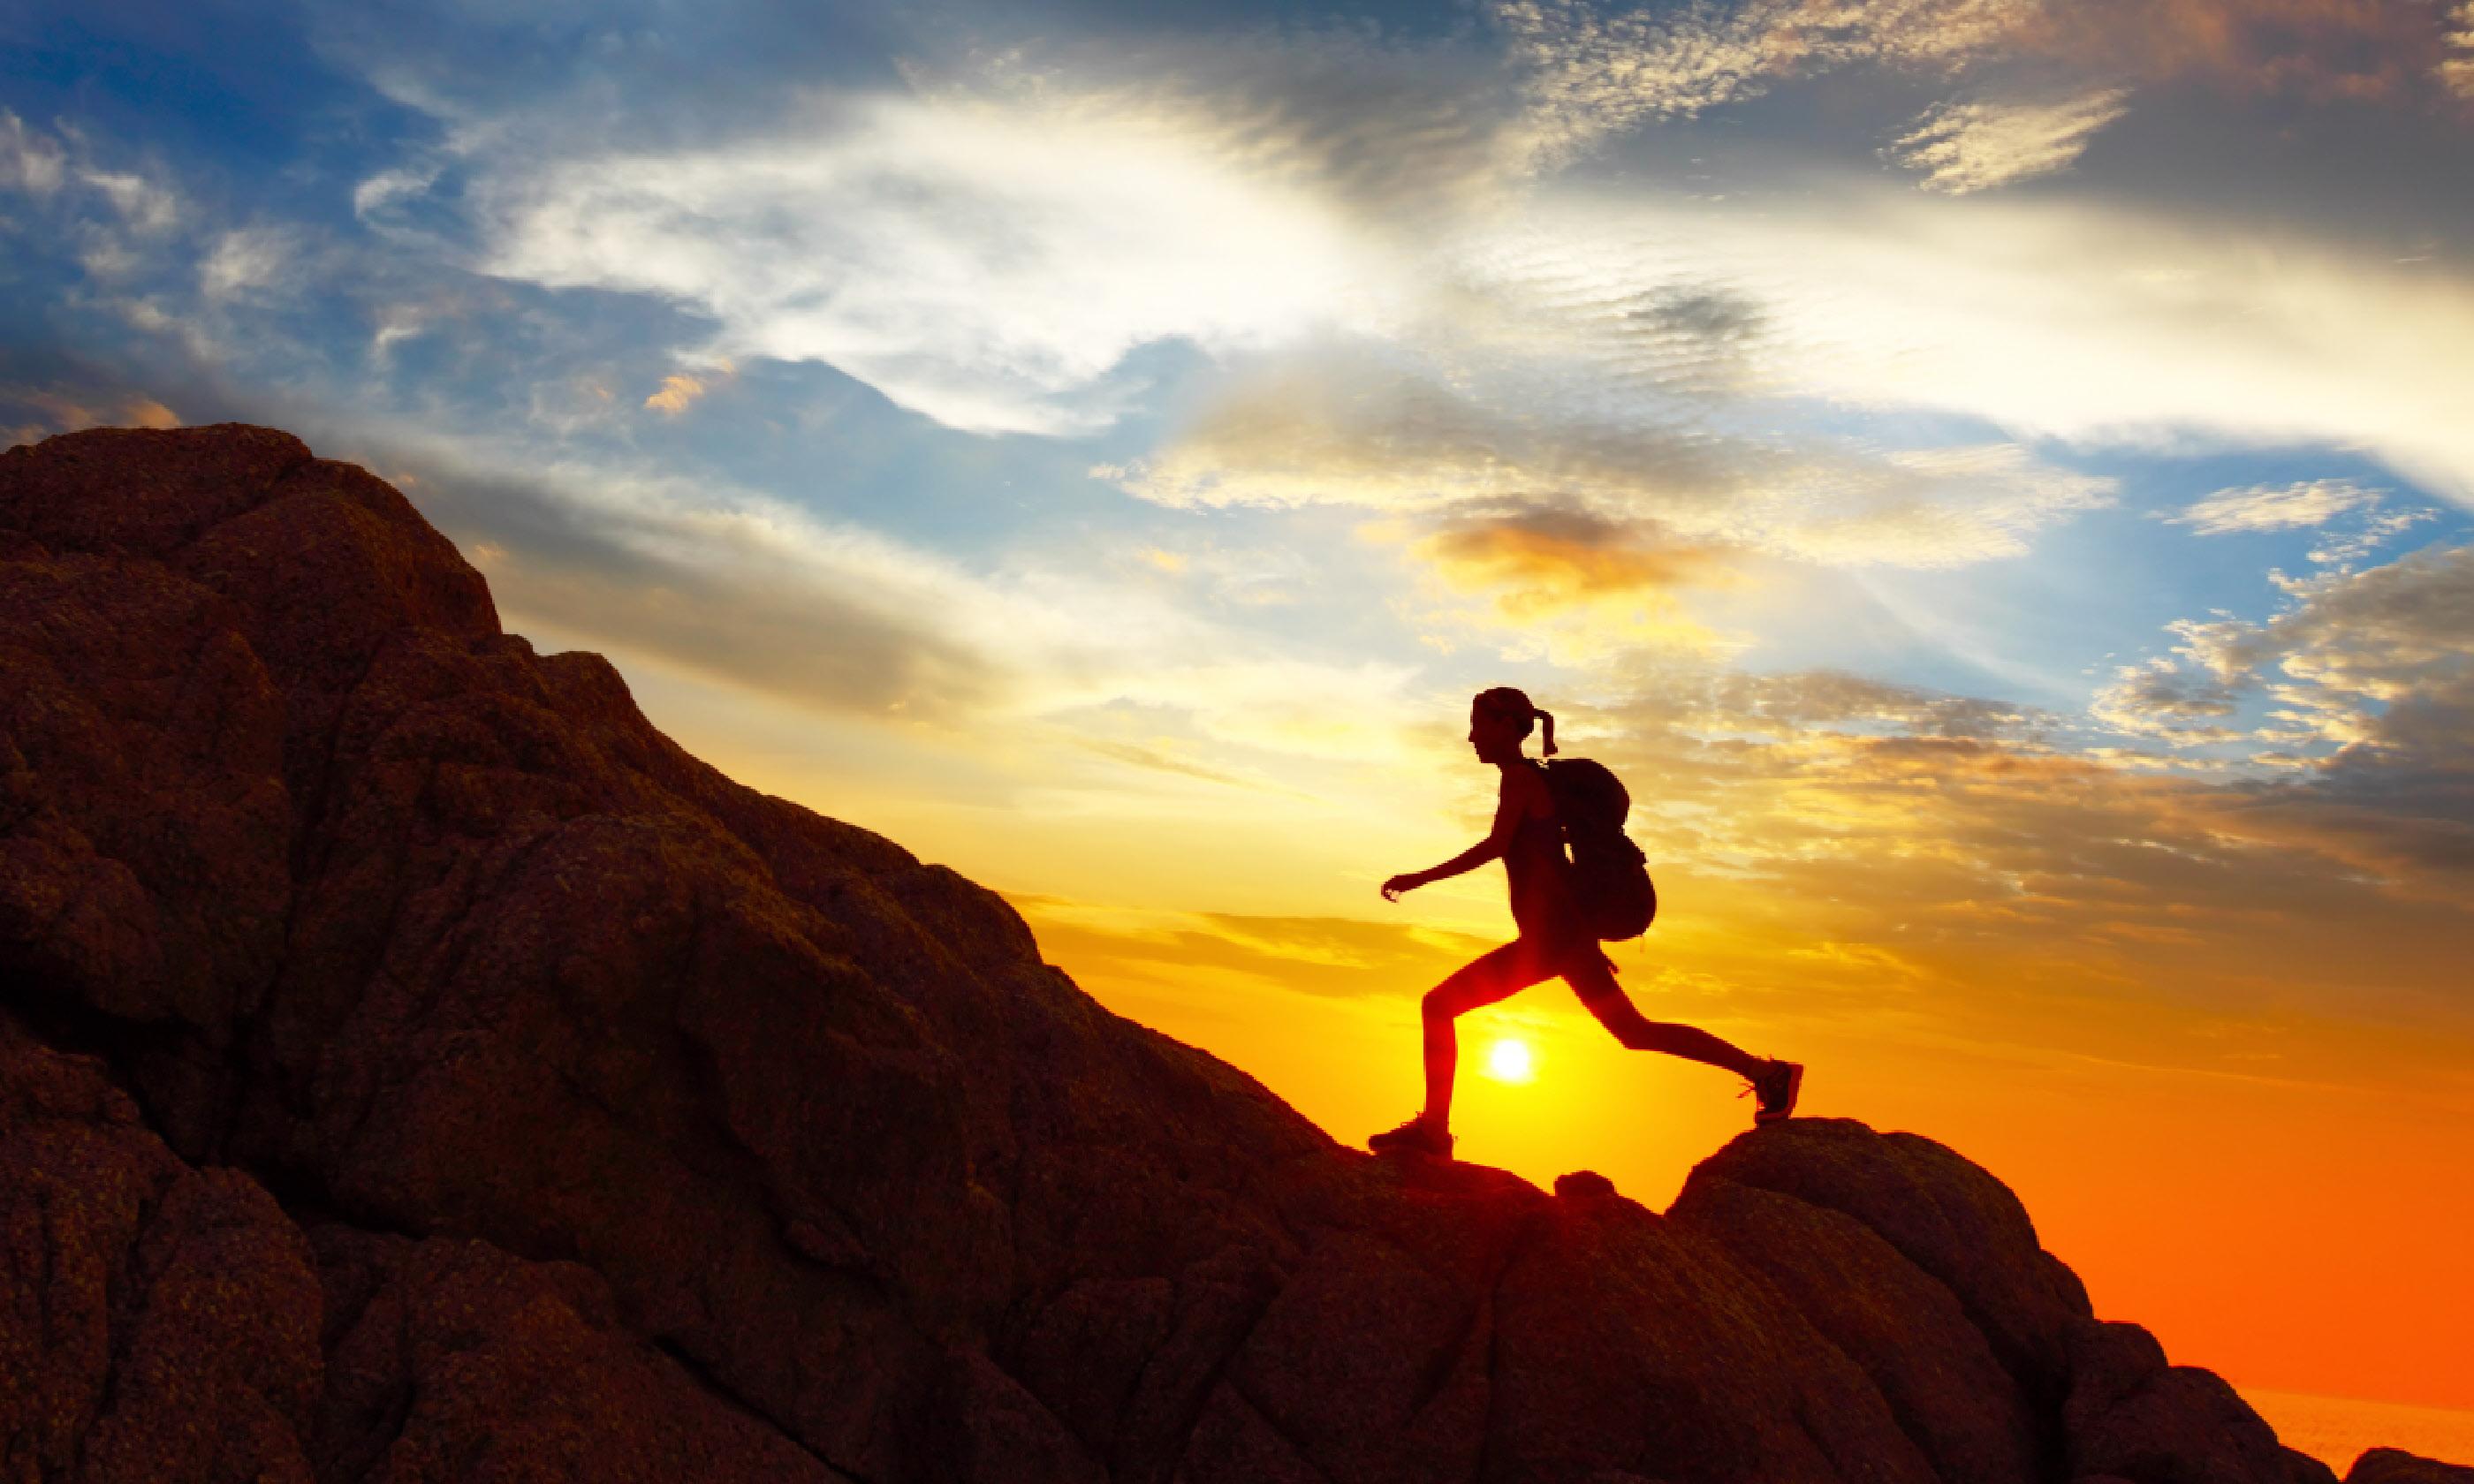 Hiker with backpack crossing rocky terrain (Shutterstock: see credit below)